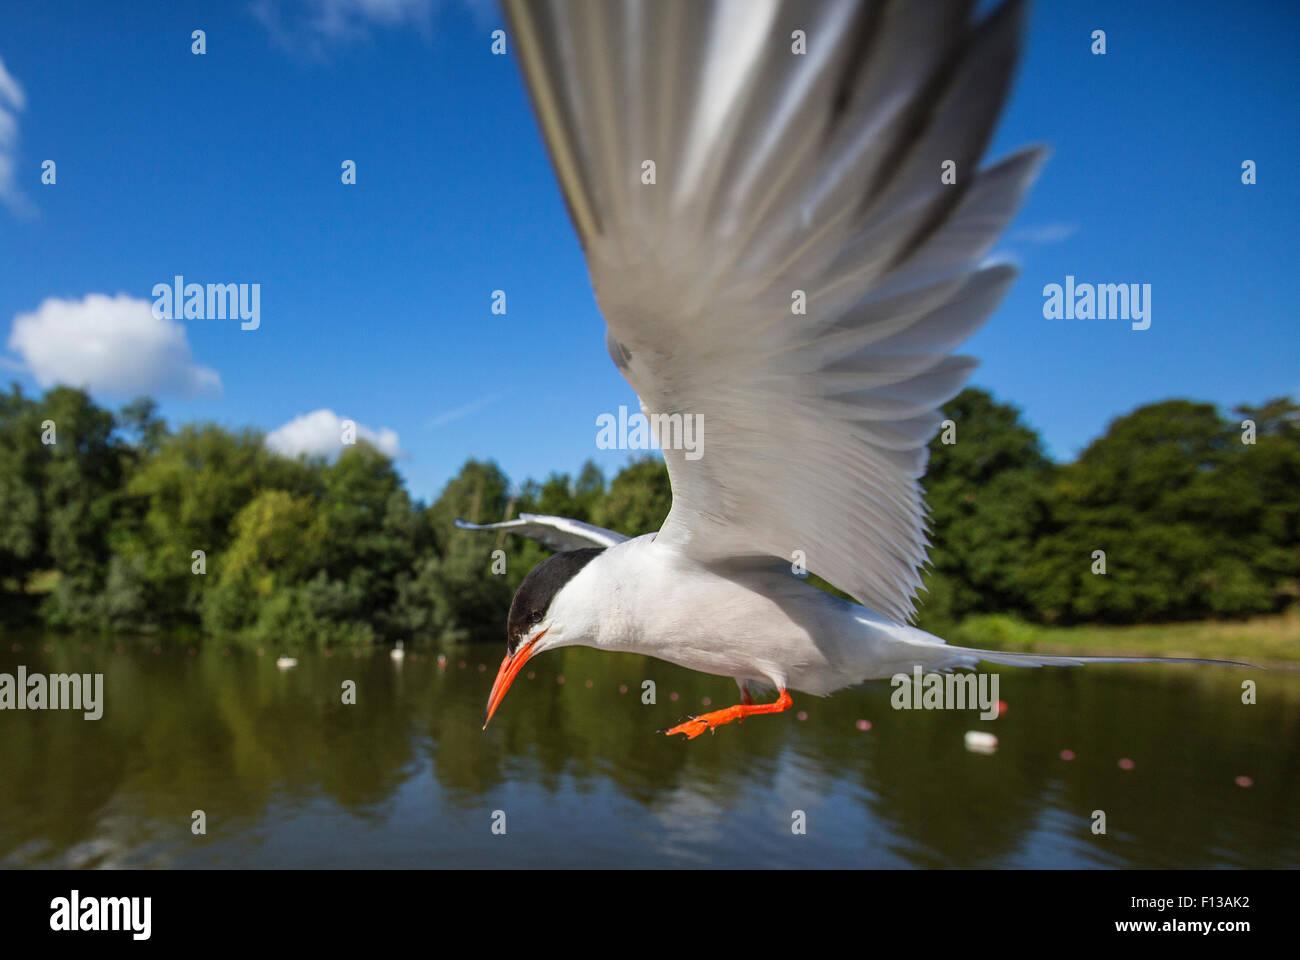 Common tern (Sterna hirundo) in flight over water, Hampstead Heath, London, UK, August. - Stock Image